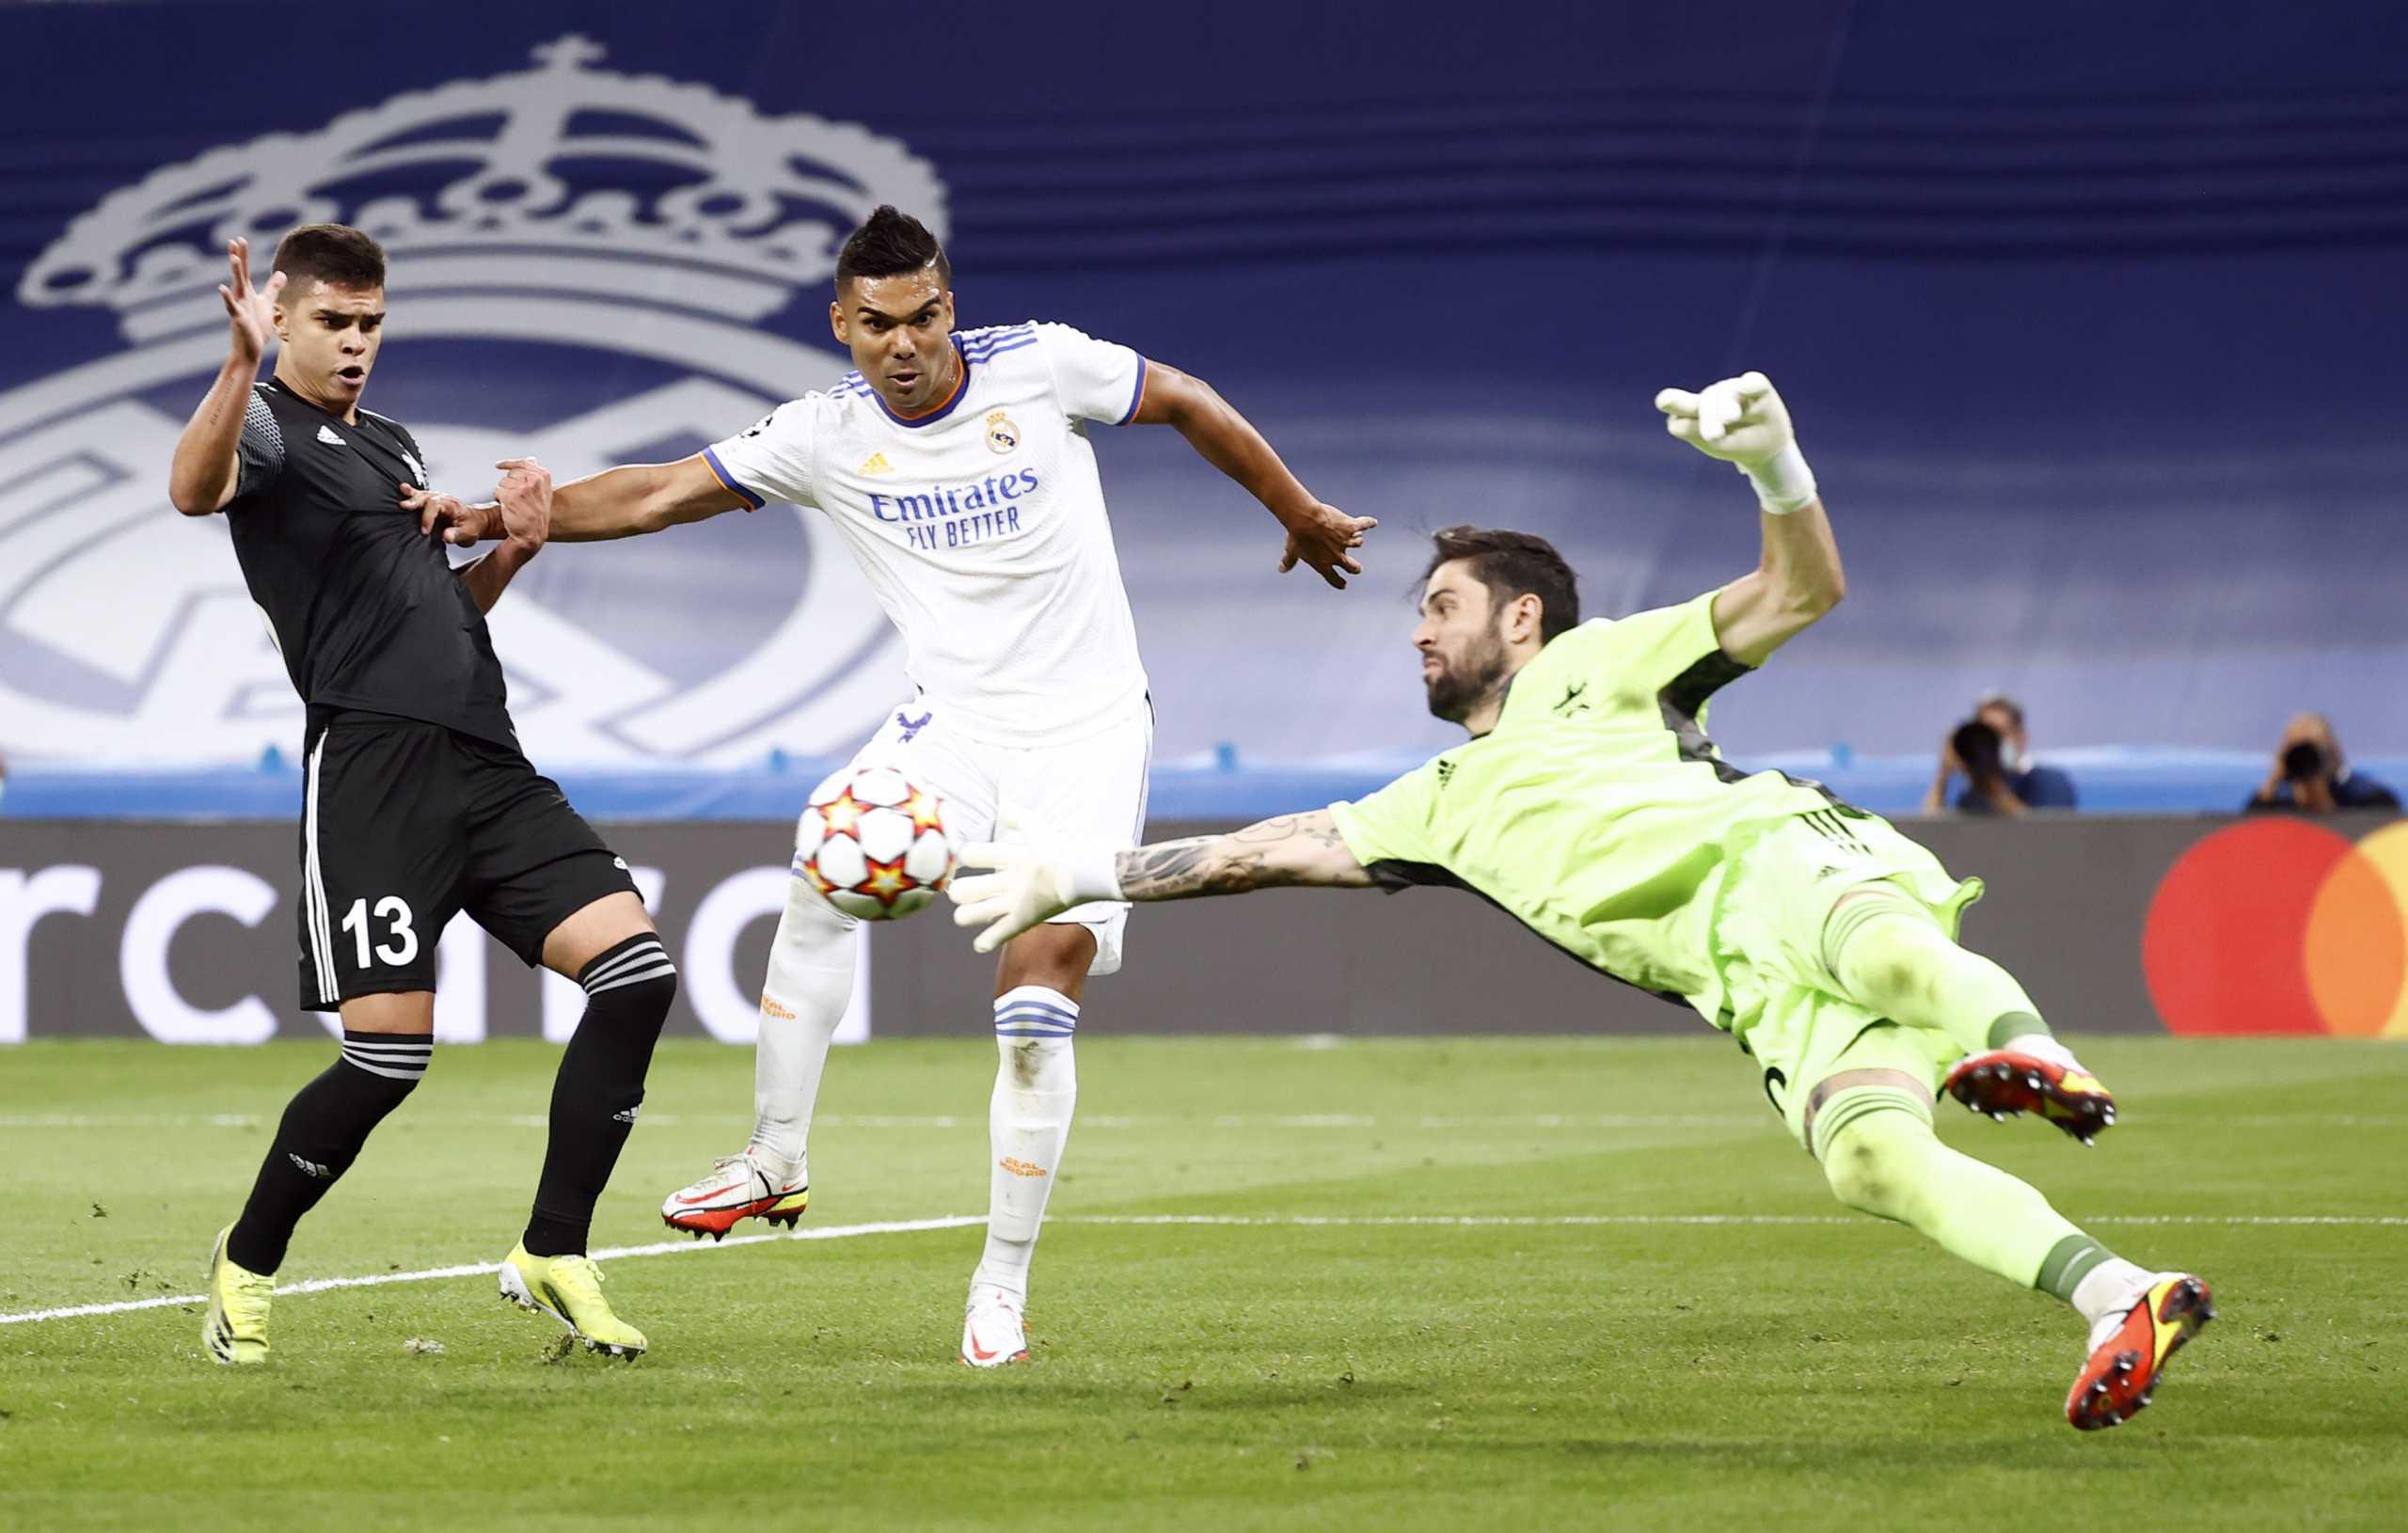 Champions League, Ρεάλ – Σέριφ: Ο Γιώργος Αθανασιάδης MVP του ματς – Δείτε όλες τις επεμβάσεις